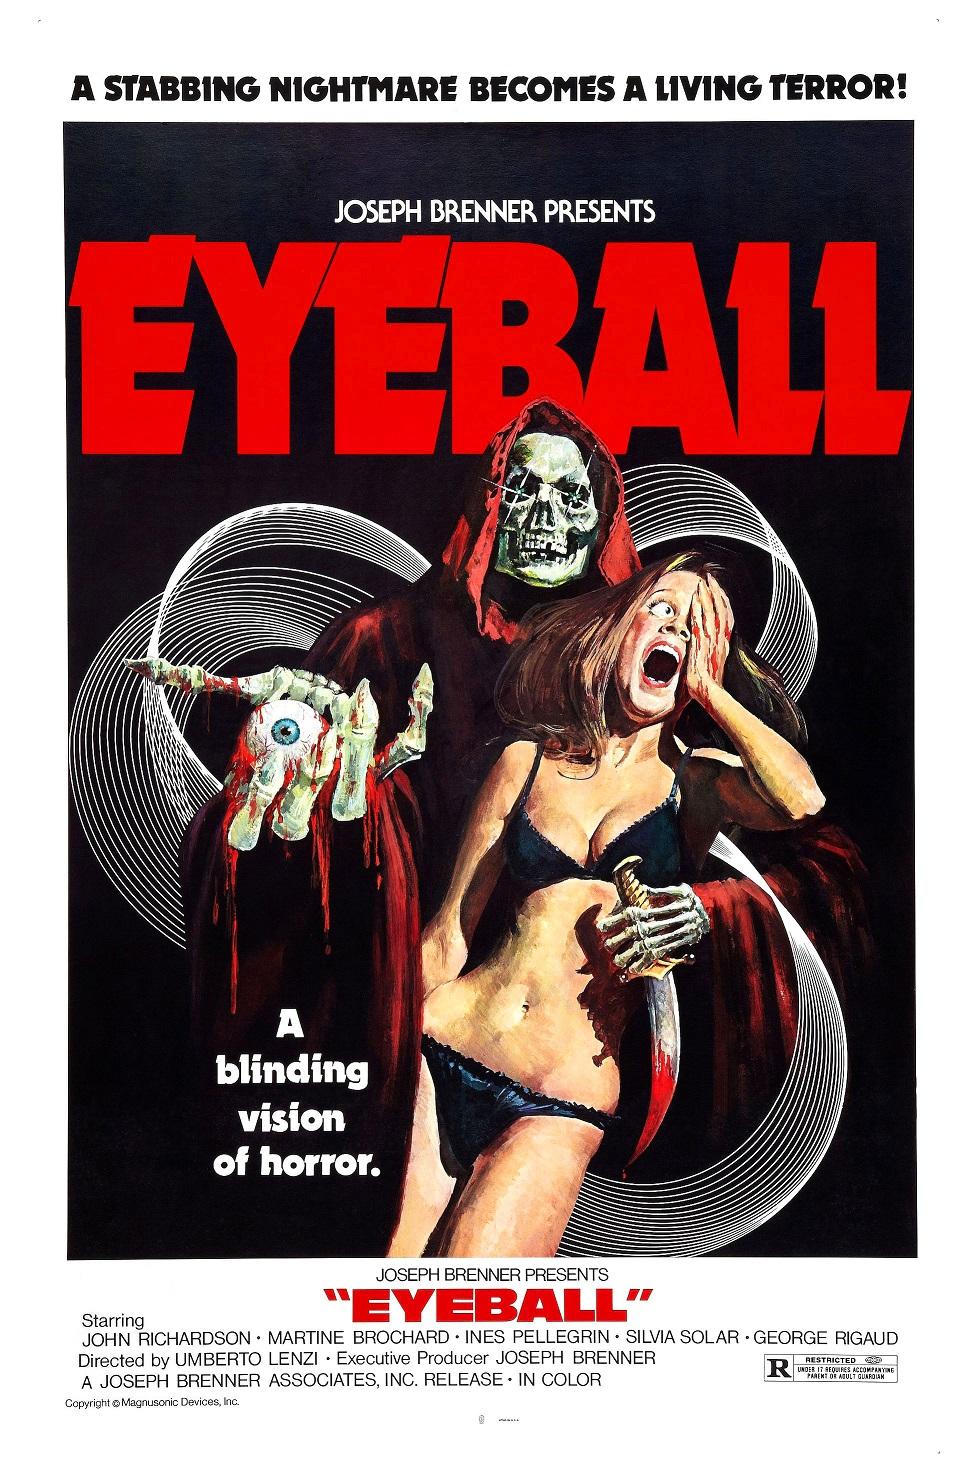 eyeball-2kite44eyeball-2eyeball-9eyeball-12eyeball-24